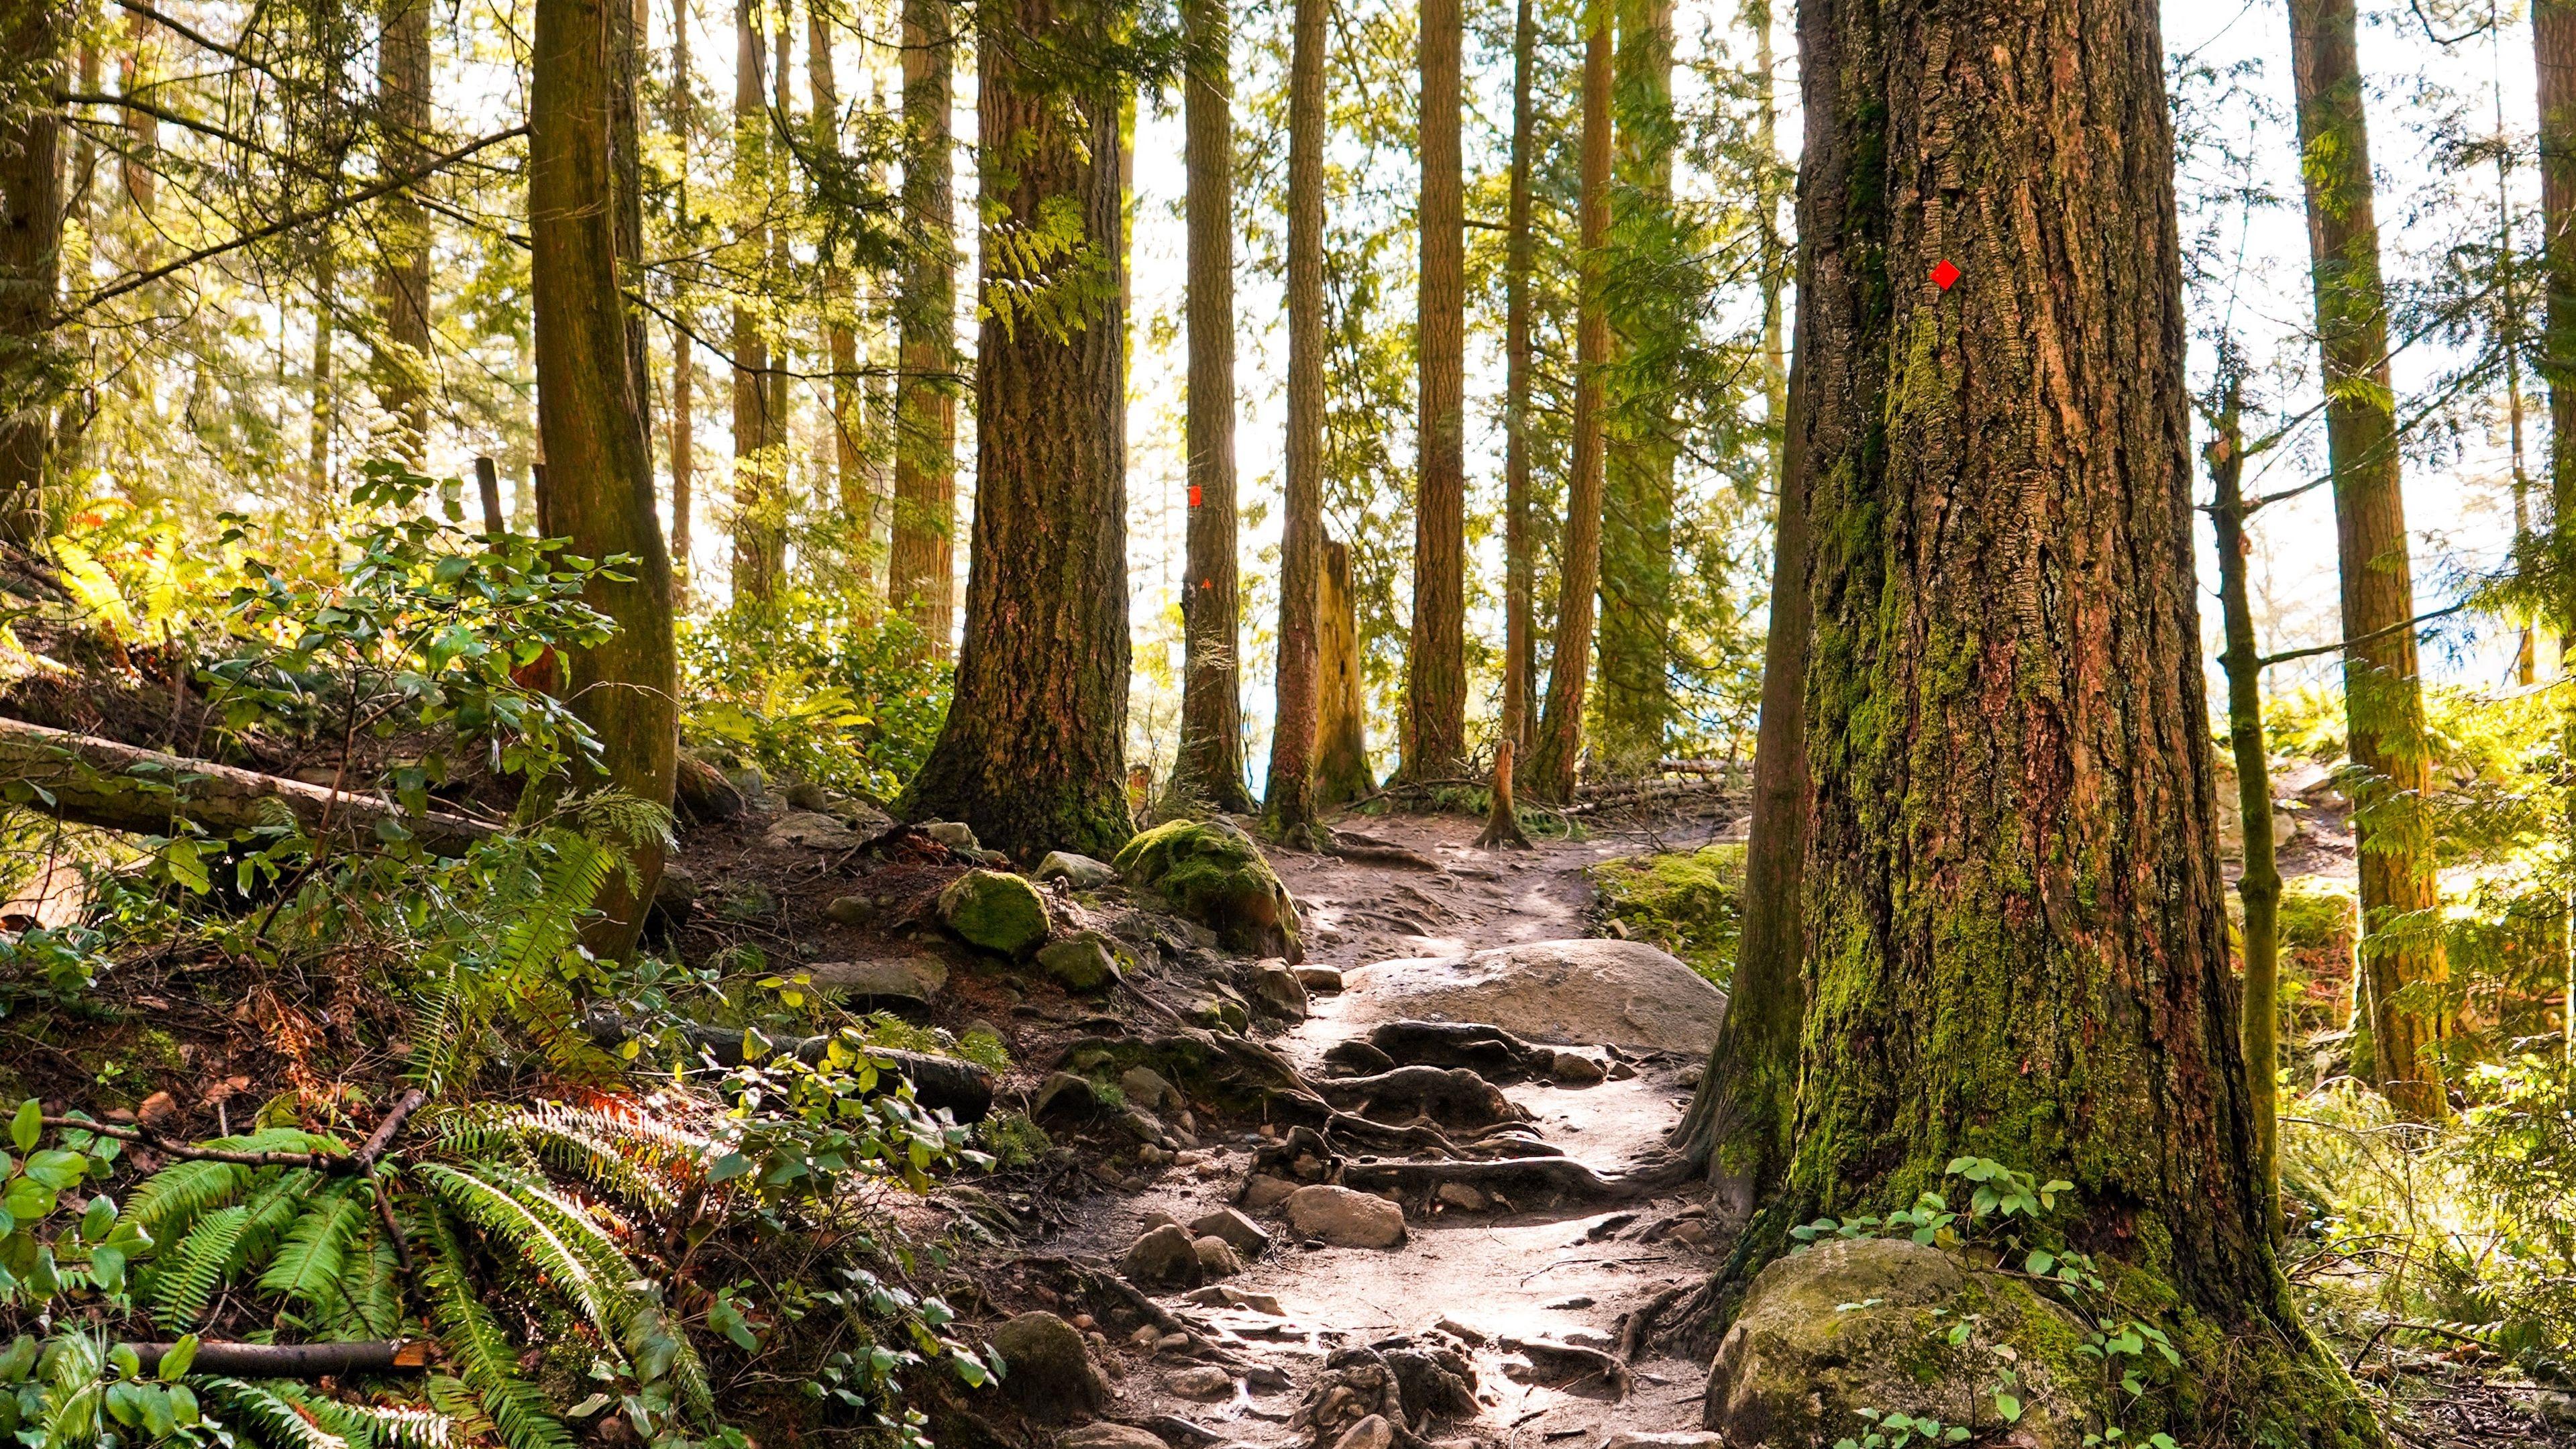 Forest desktop wallpaper free download